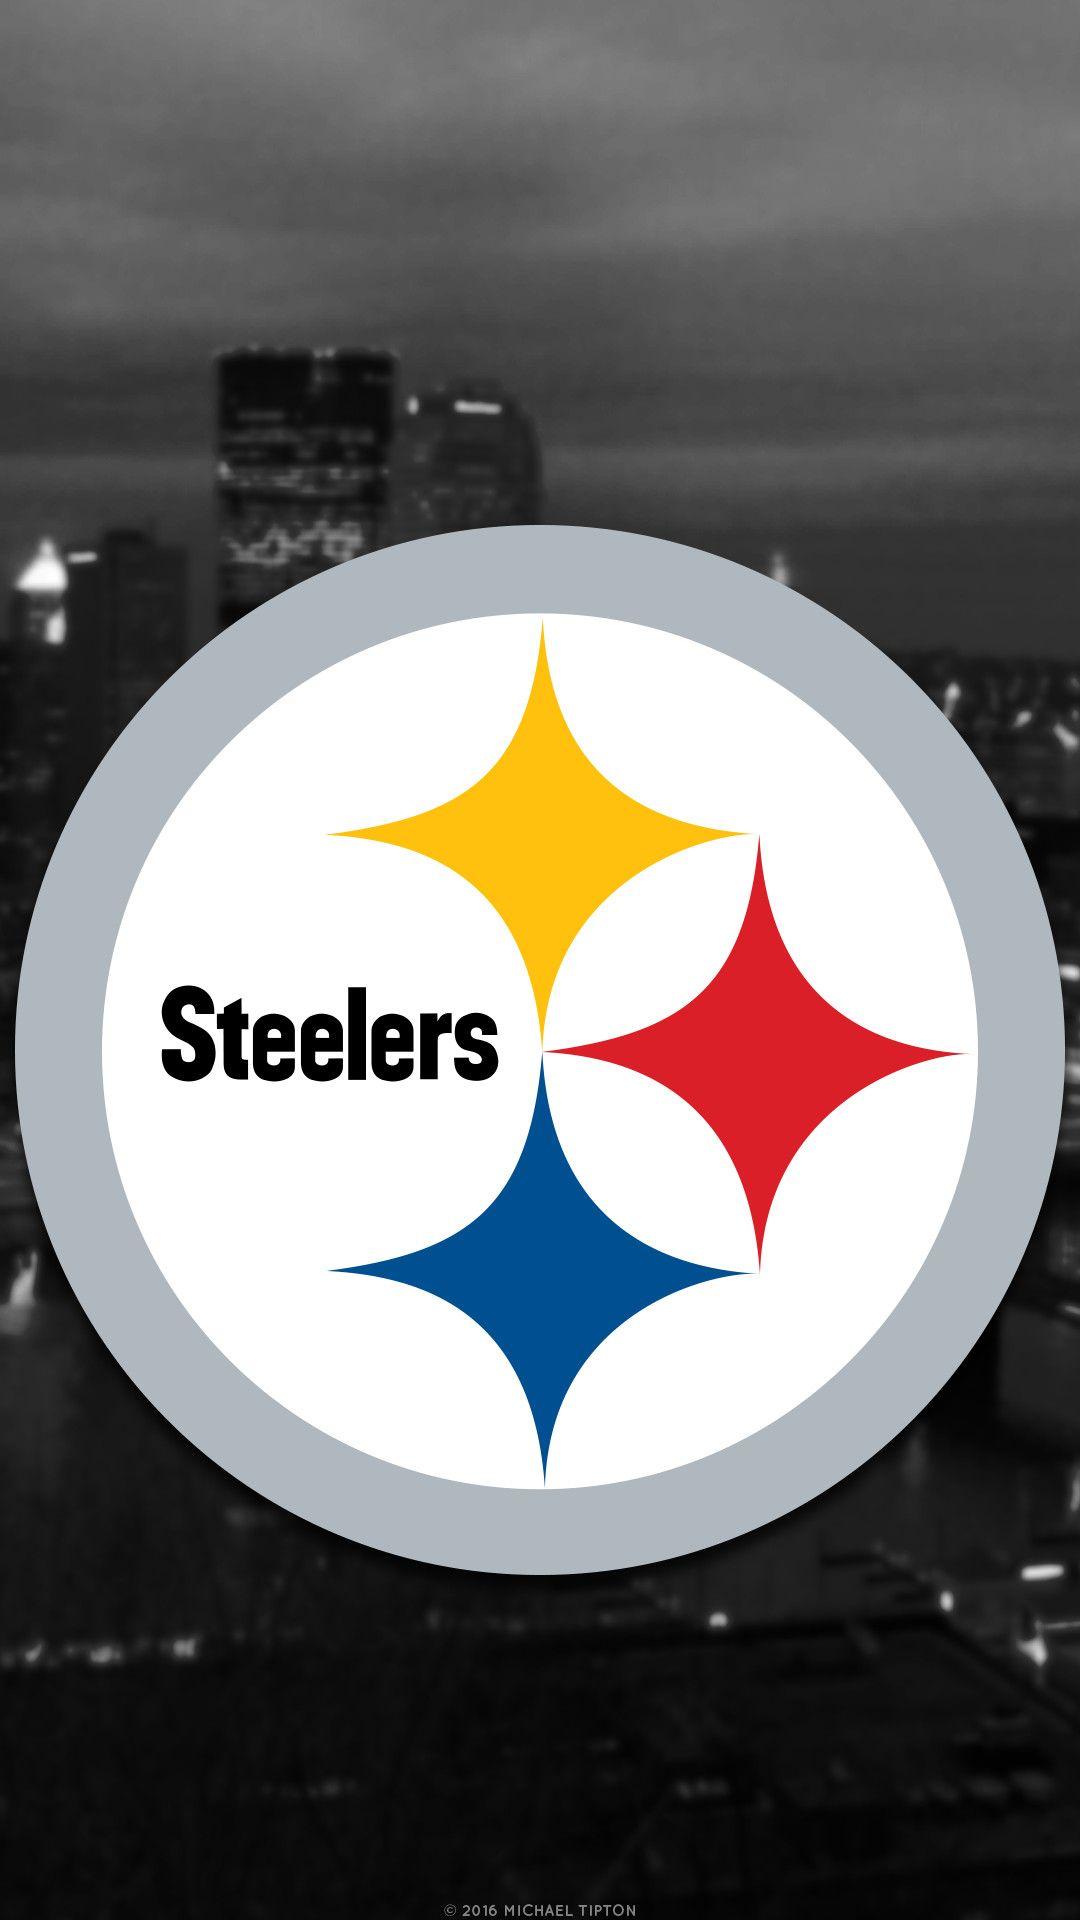 1080x1920 Galaxy Pittsburgh Steelers City 2017 Logo Wallpaper Free Iphone 5 6 7 Galaxy S6 Pittsburgh Steelers Wallpaper Steelers Pittsburgh Steelers